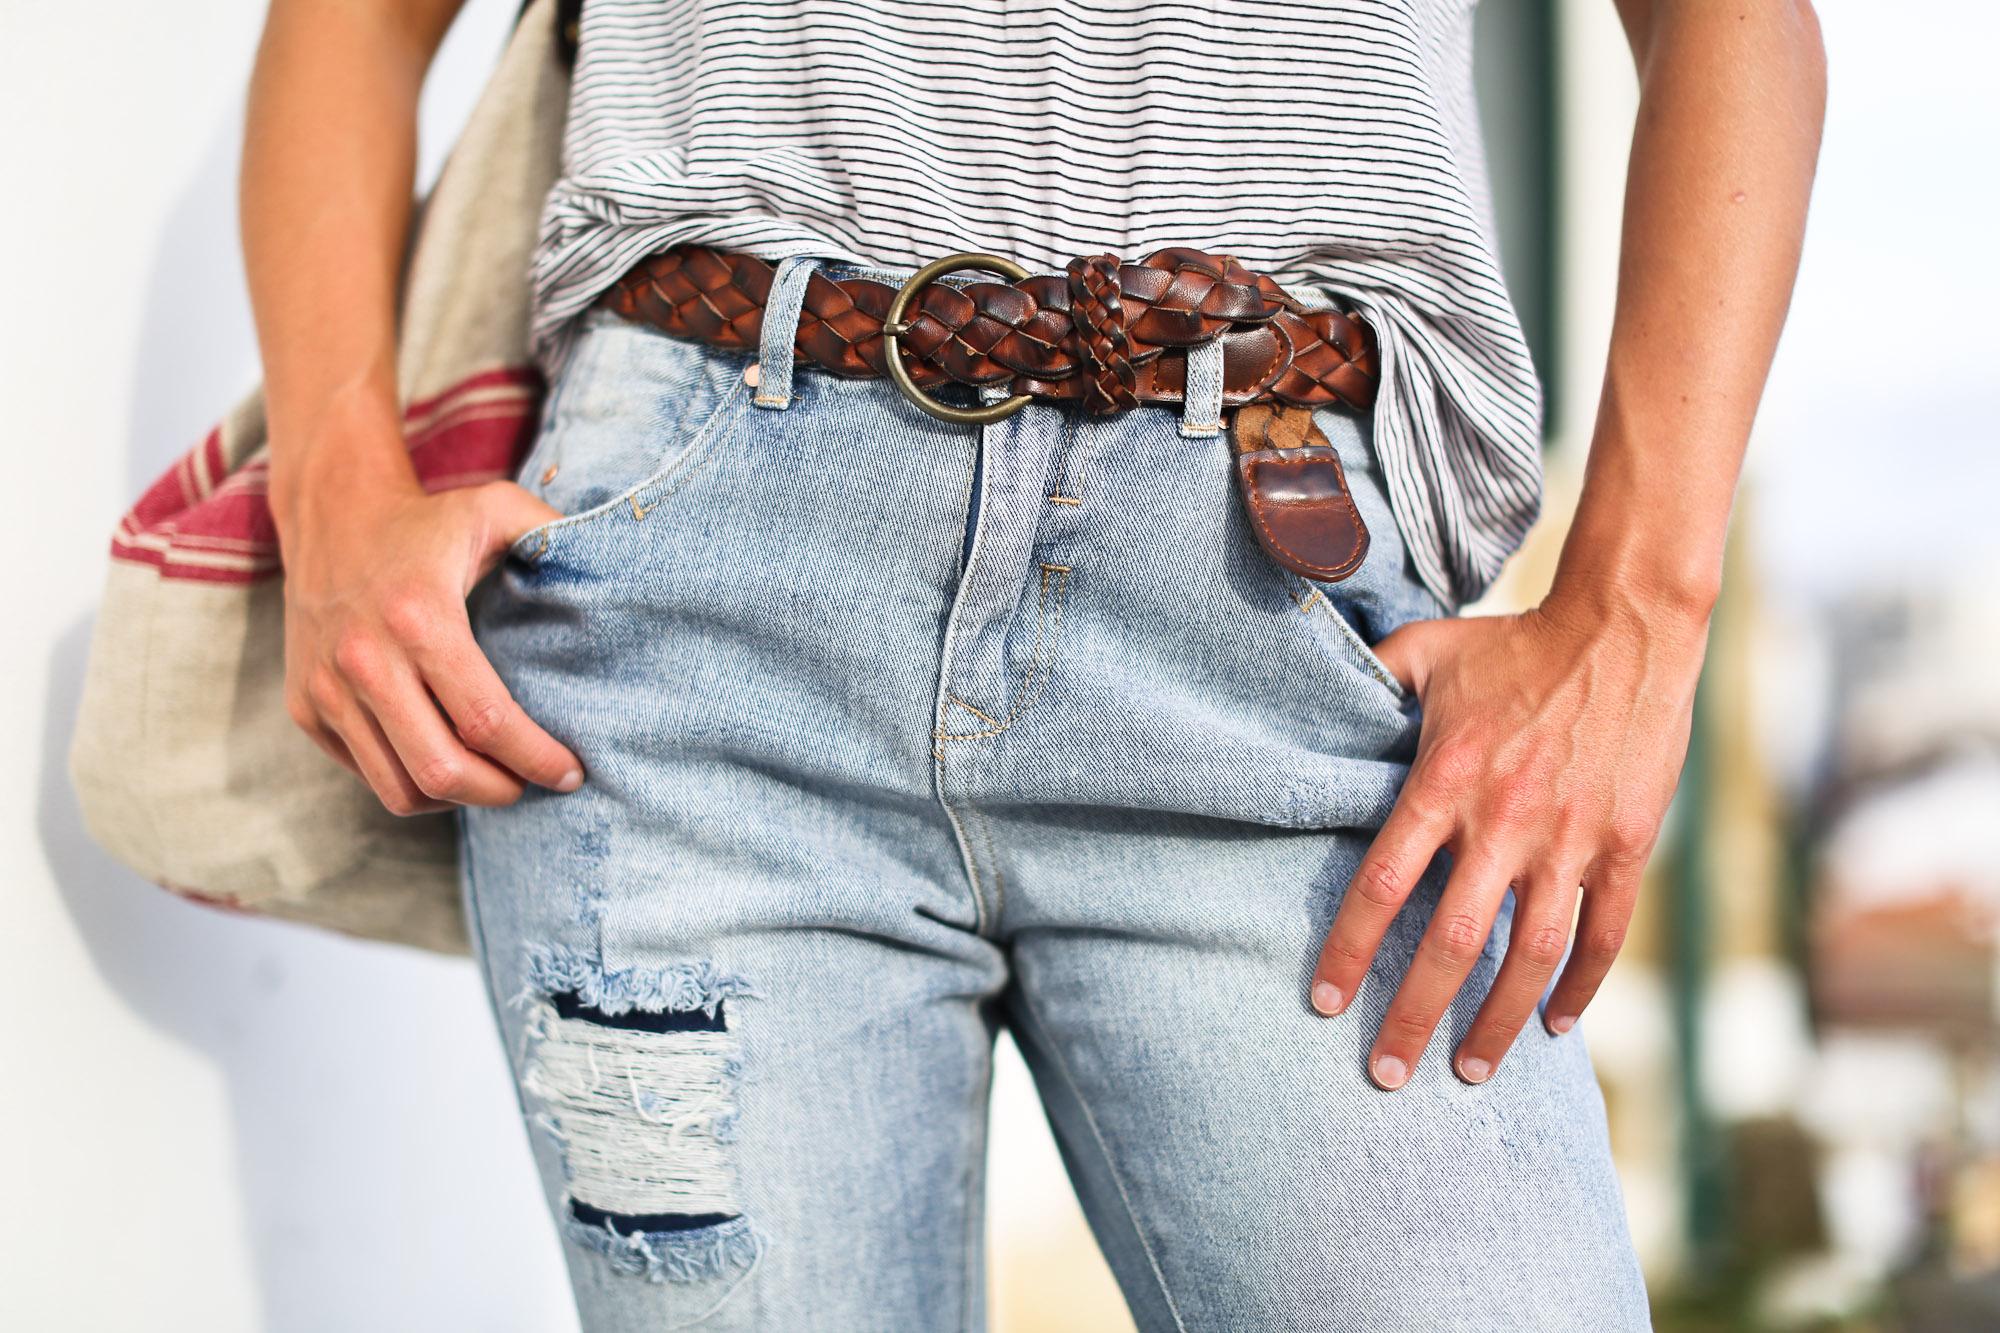 Clochet_streetstyle_suiteblanco_boyfriend_jeans_bandana_scarf_mg_linen_bag-8